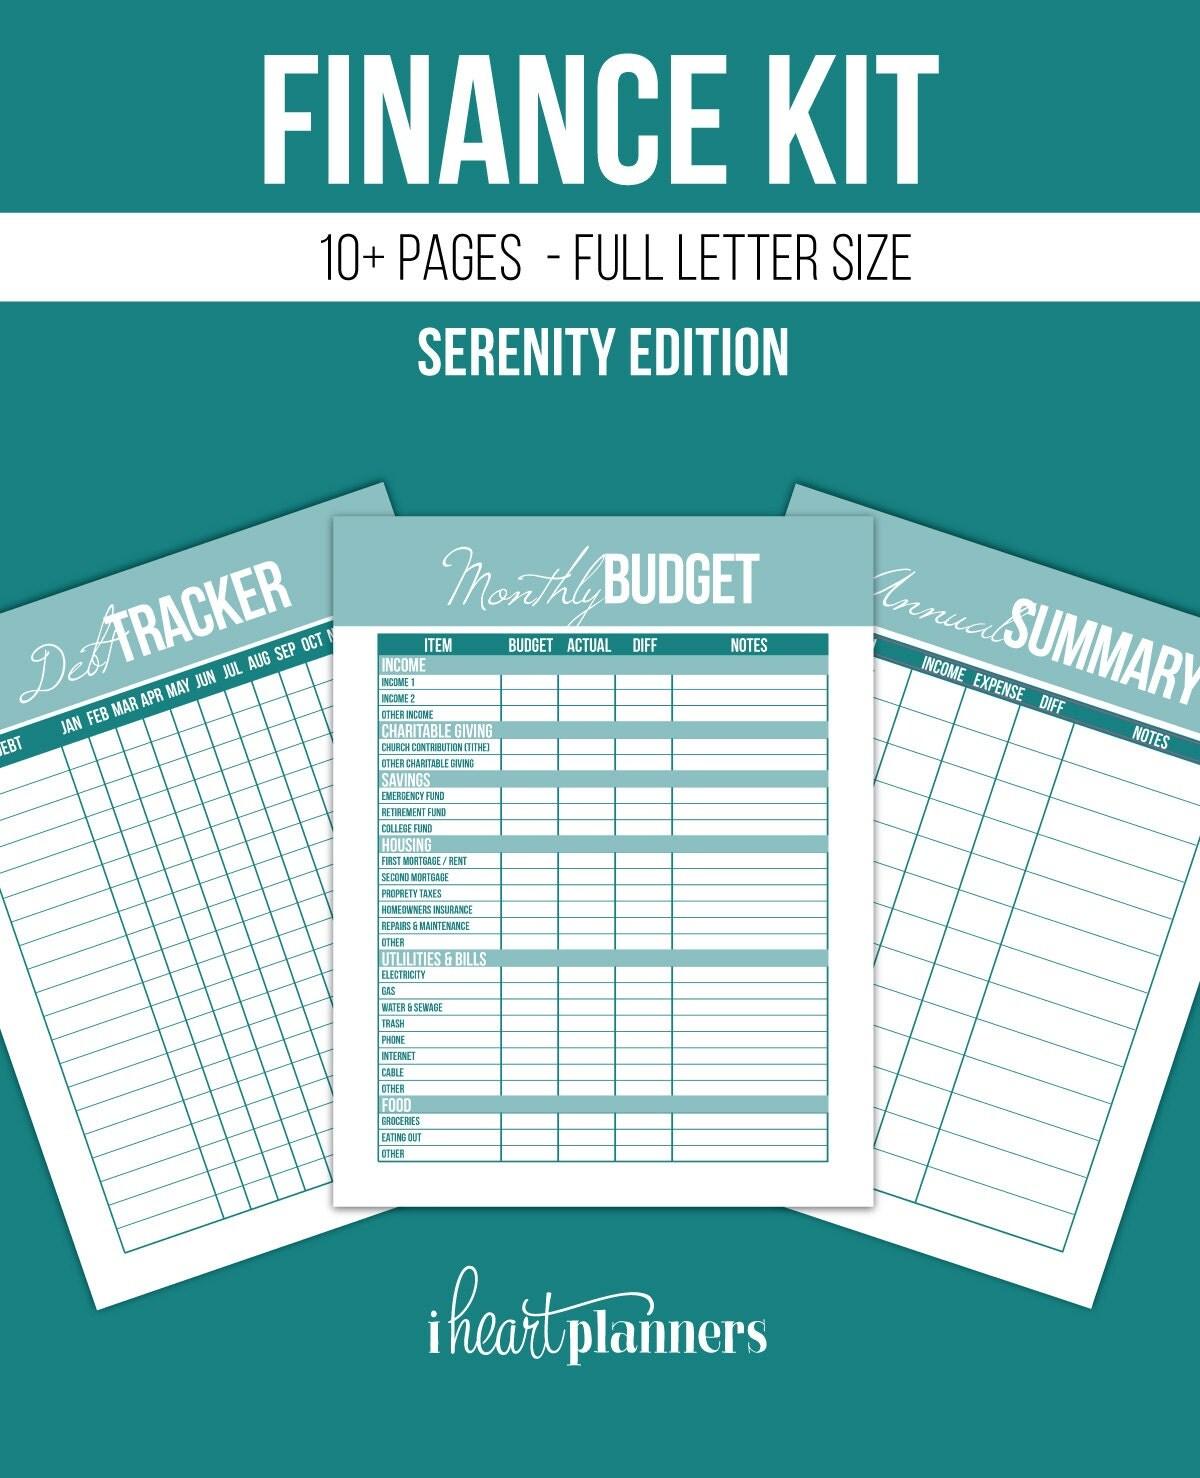 Finance Printables Kit Full Letter Size Serenity Edition